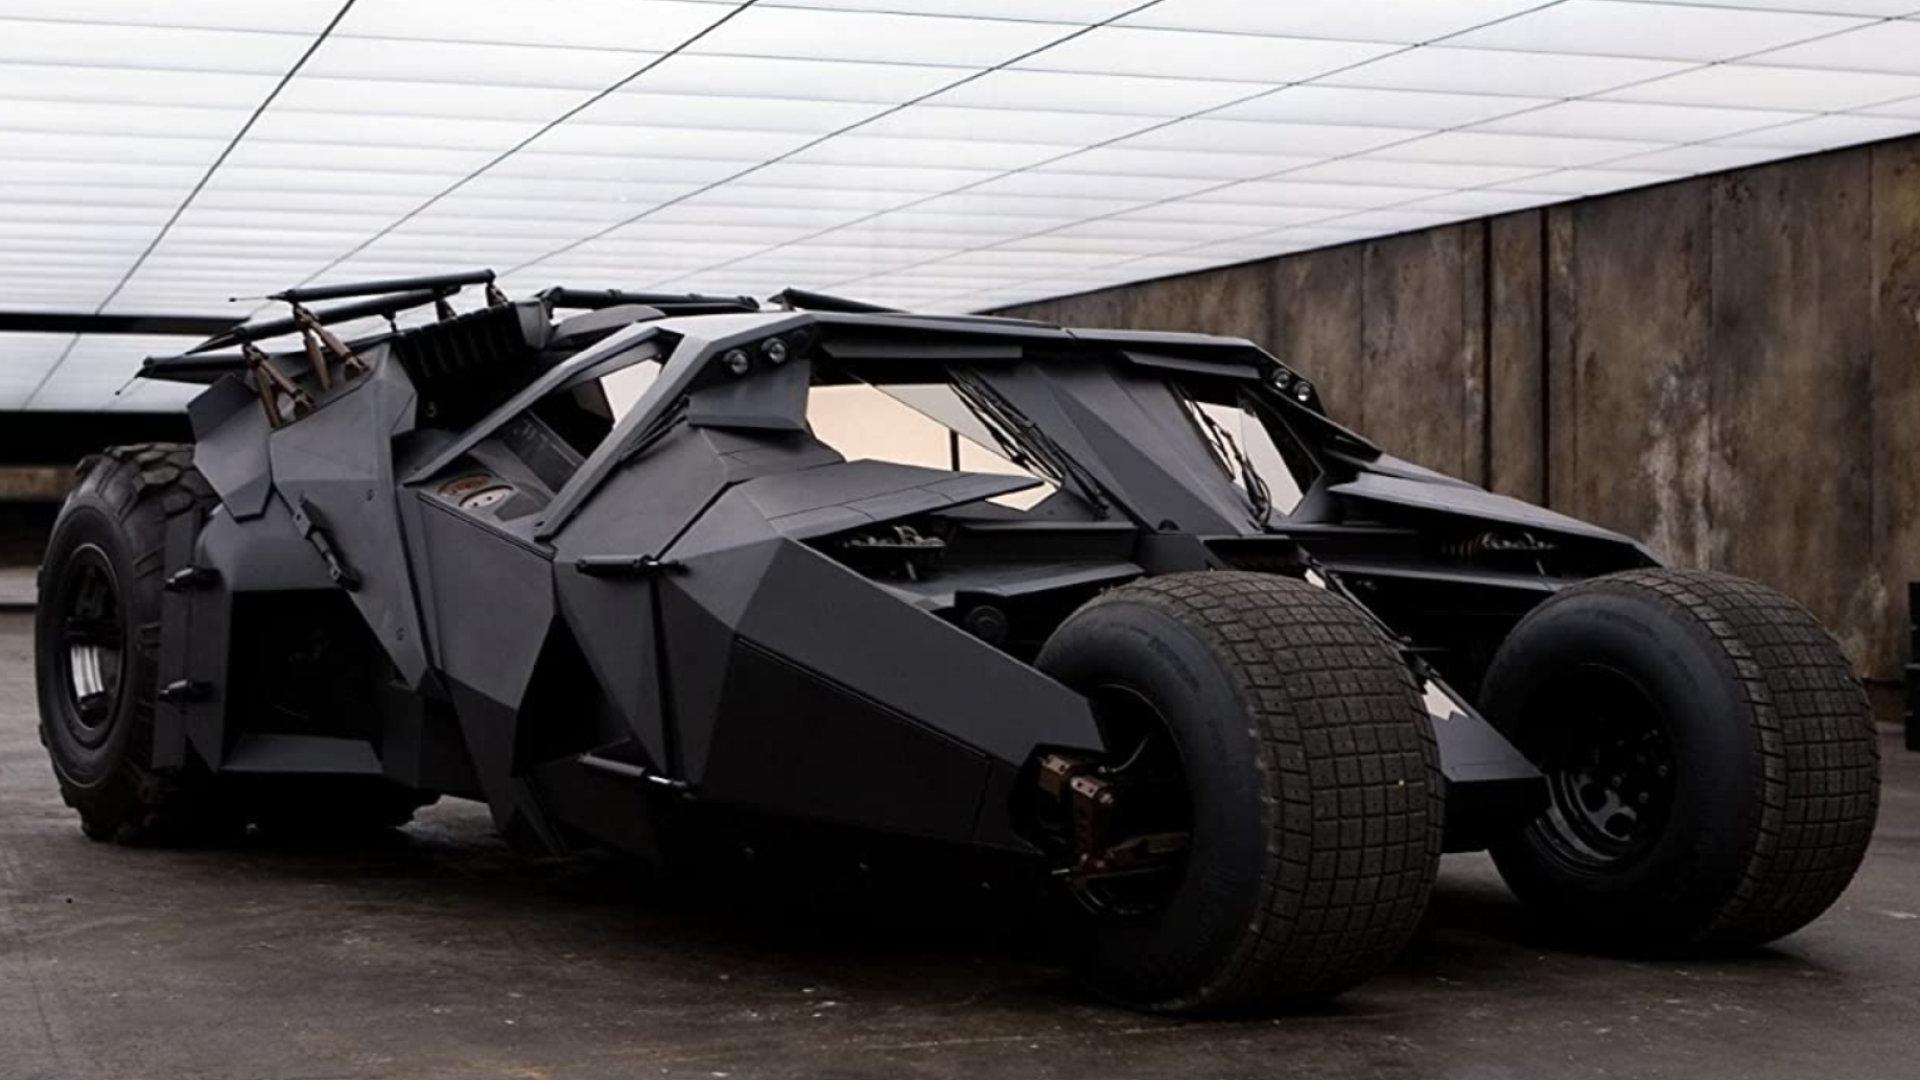 Quelle: Warner Bros. Entertainment - Tumbler (Batmobil) aus dem Film The Dark Knight